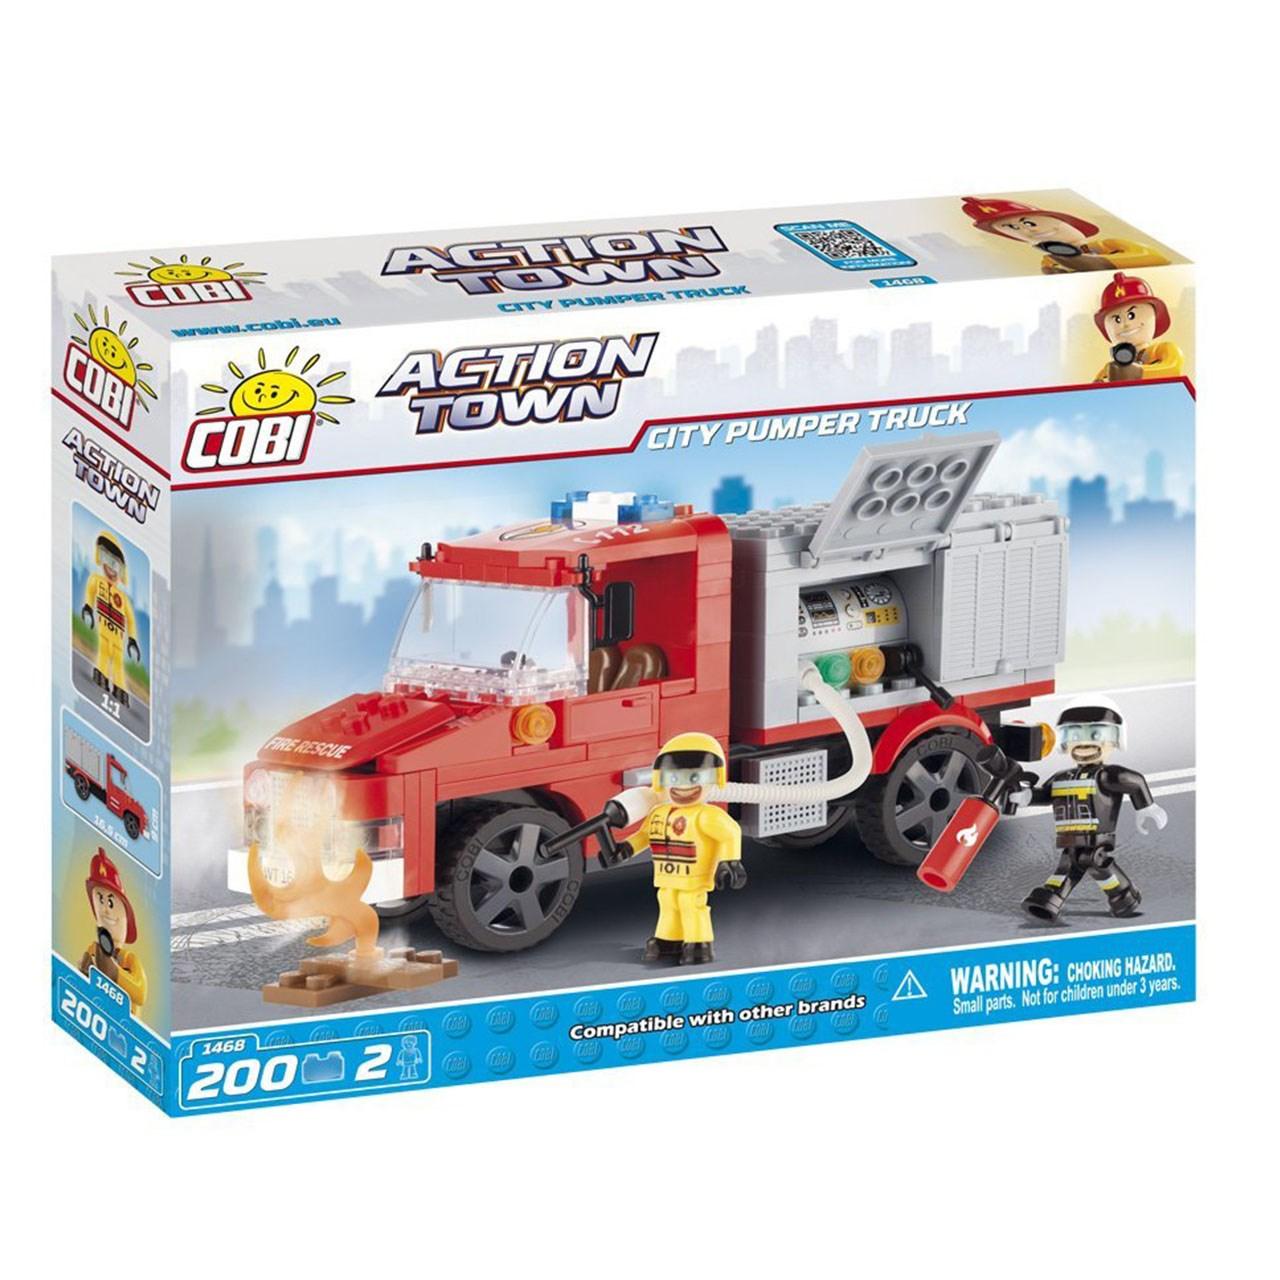 لگو کوبی مدل Action Town - City Pumper Truck